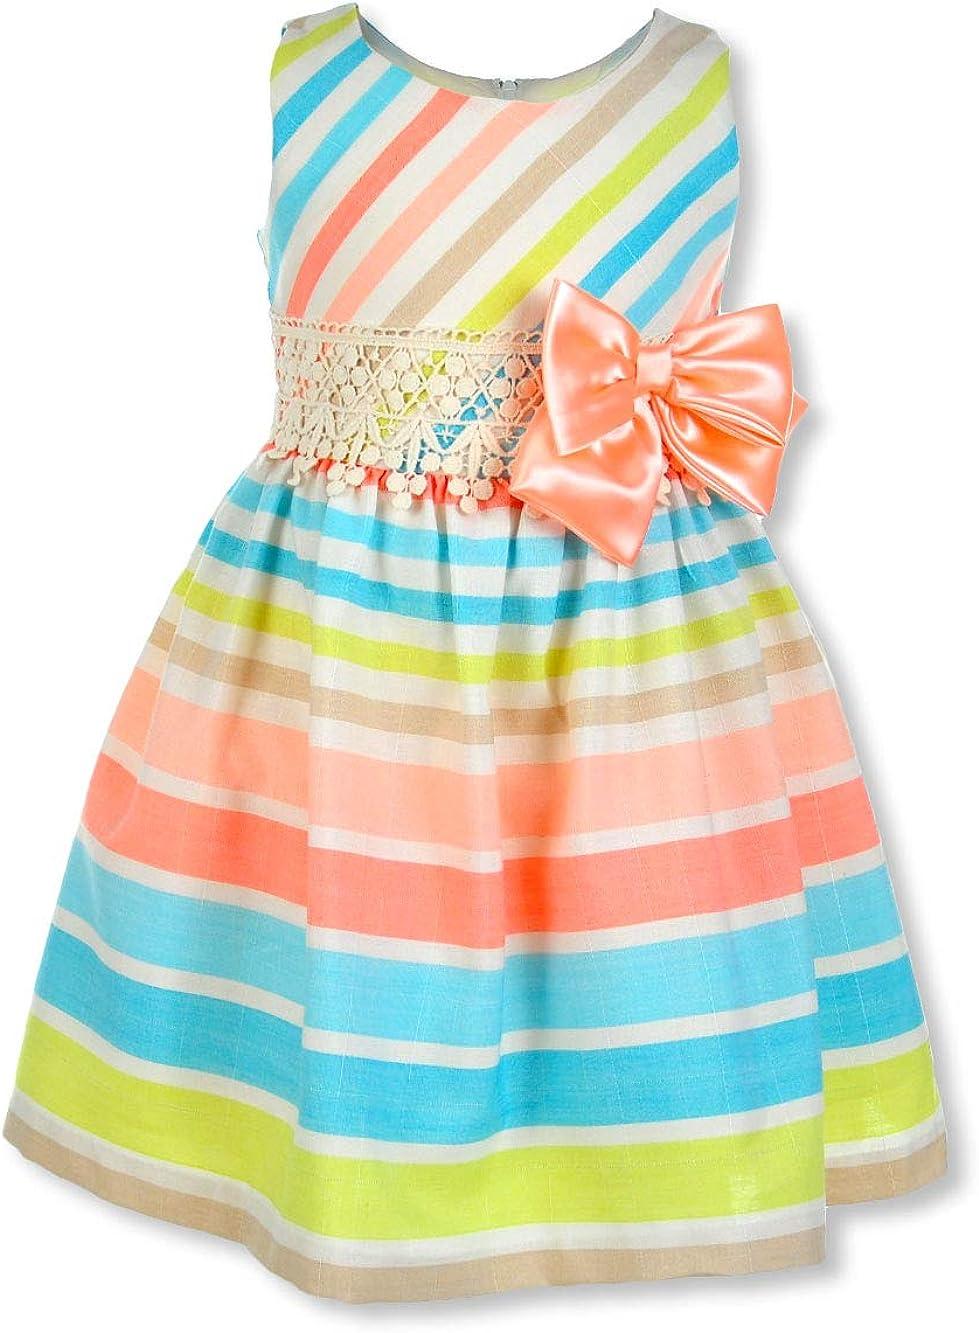 Bonnie Jean Girls' Spring Bow Linen Dress